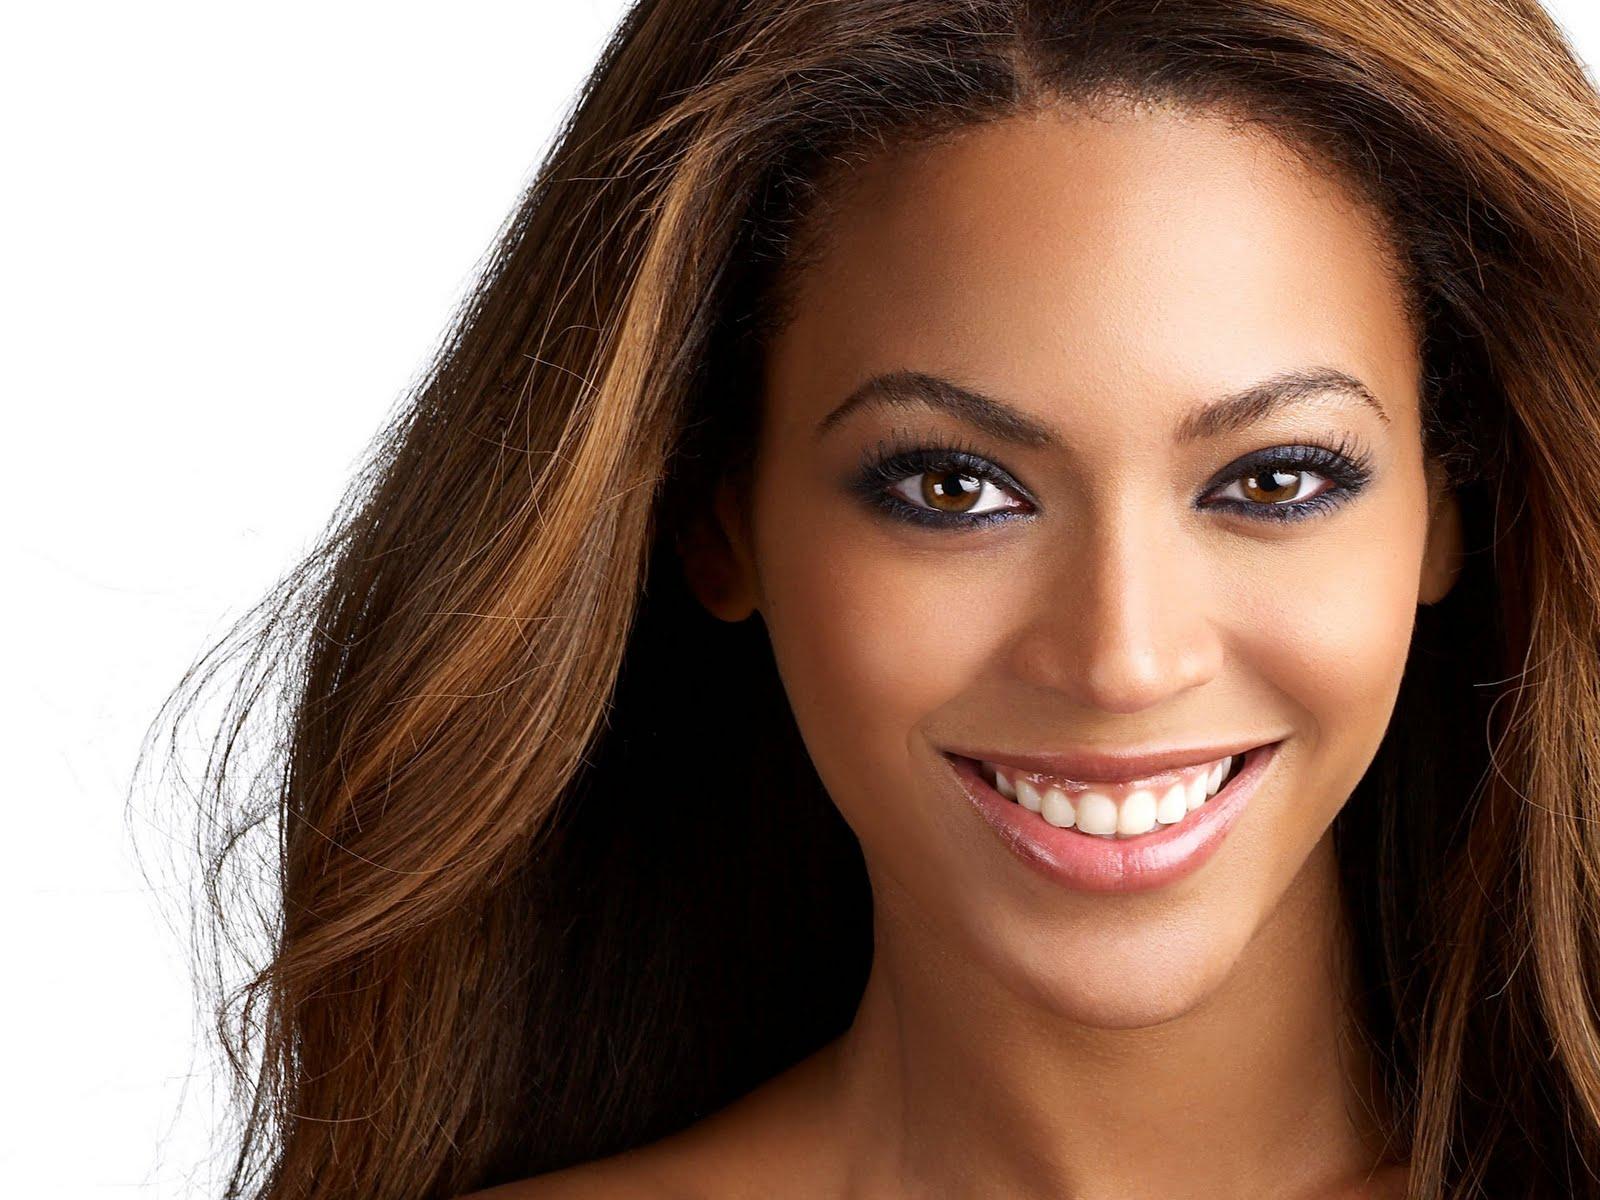 http://3.bp.blogspot.com/-VrSEc3CJsAc/TanutipN0zI/AAAAAAAANgg/MrNatIQbpzU/s1600/american_celebrity_Beyonce_Knowles_wallpaper%2B%25283%2529.jpg